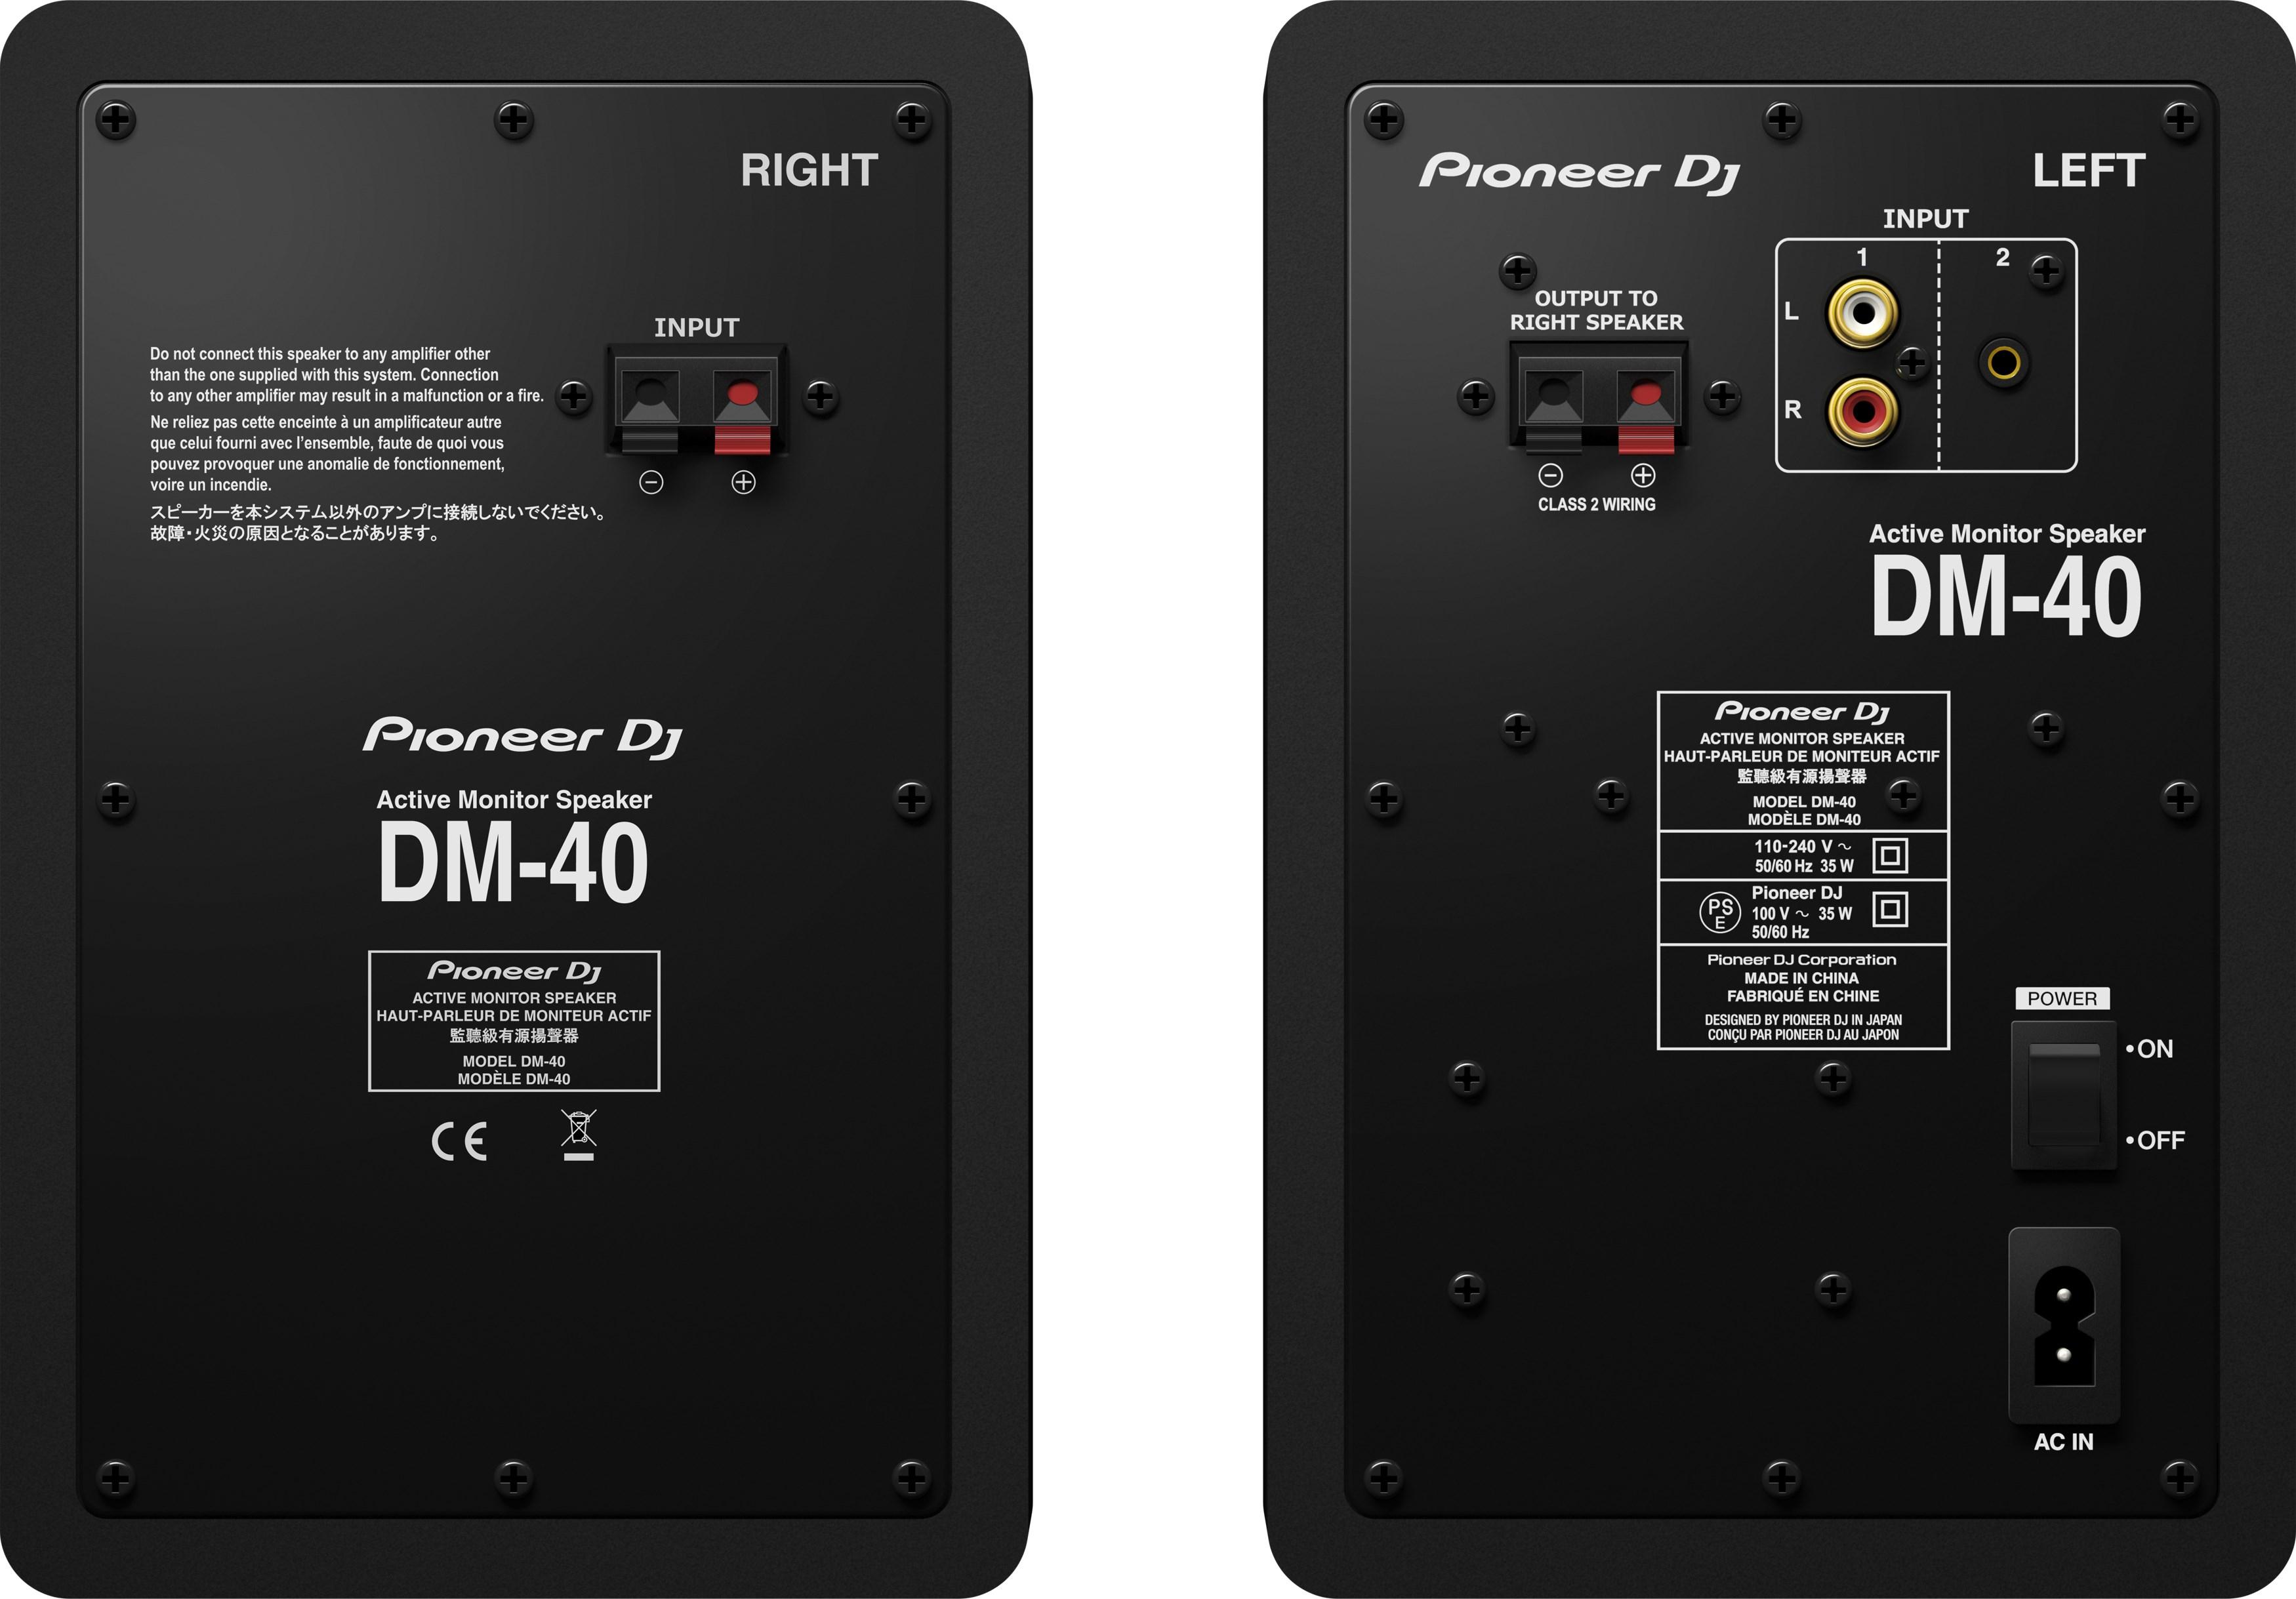 Astonishing Pioneer Dj 4 Monitor Speakers Pair Dm 40 Art Craft Wiring Digital Resources Bemuashebarightsorg